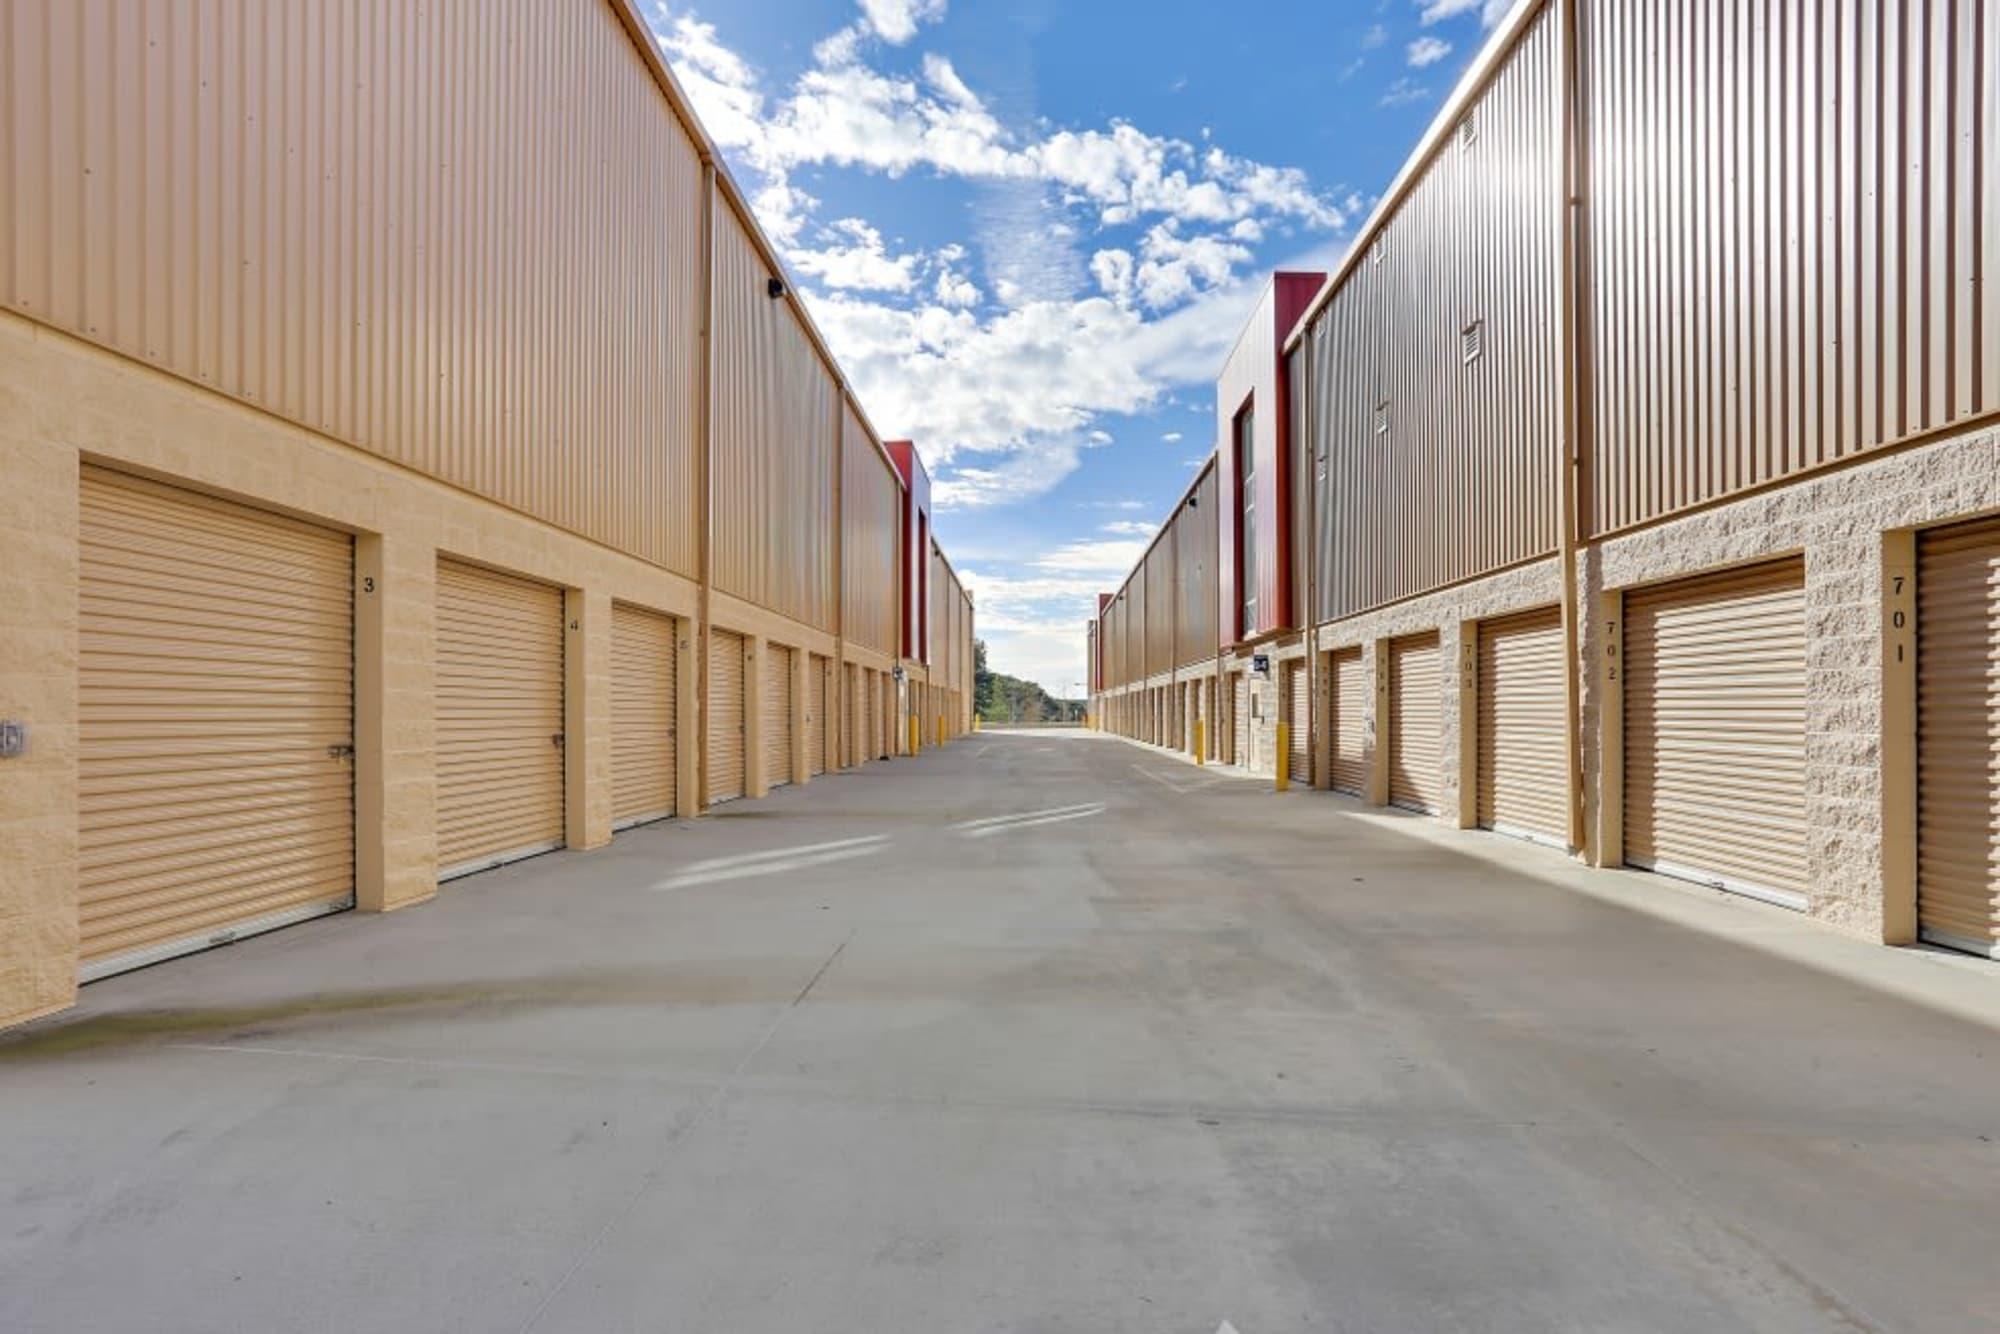 Exterior storage units at A-1 Self Storage in San Diego, CA